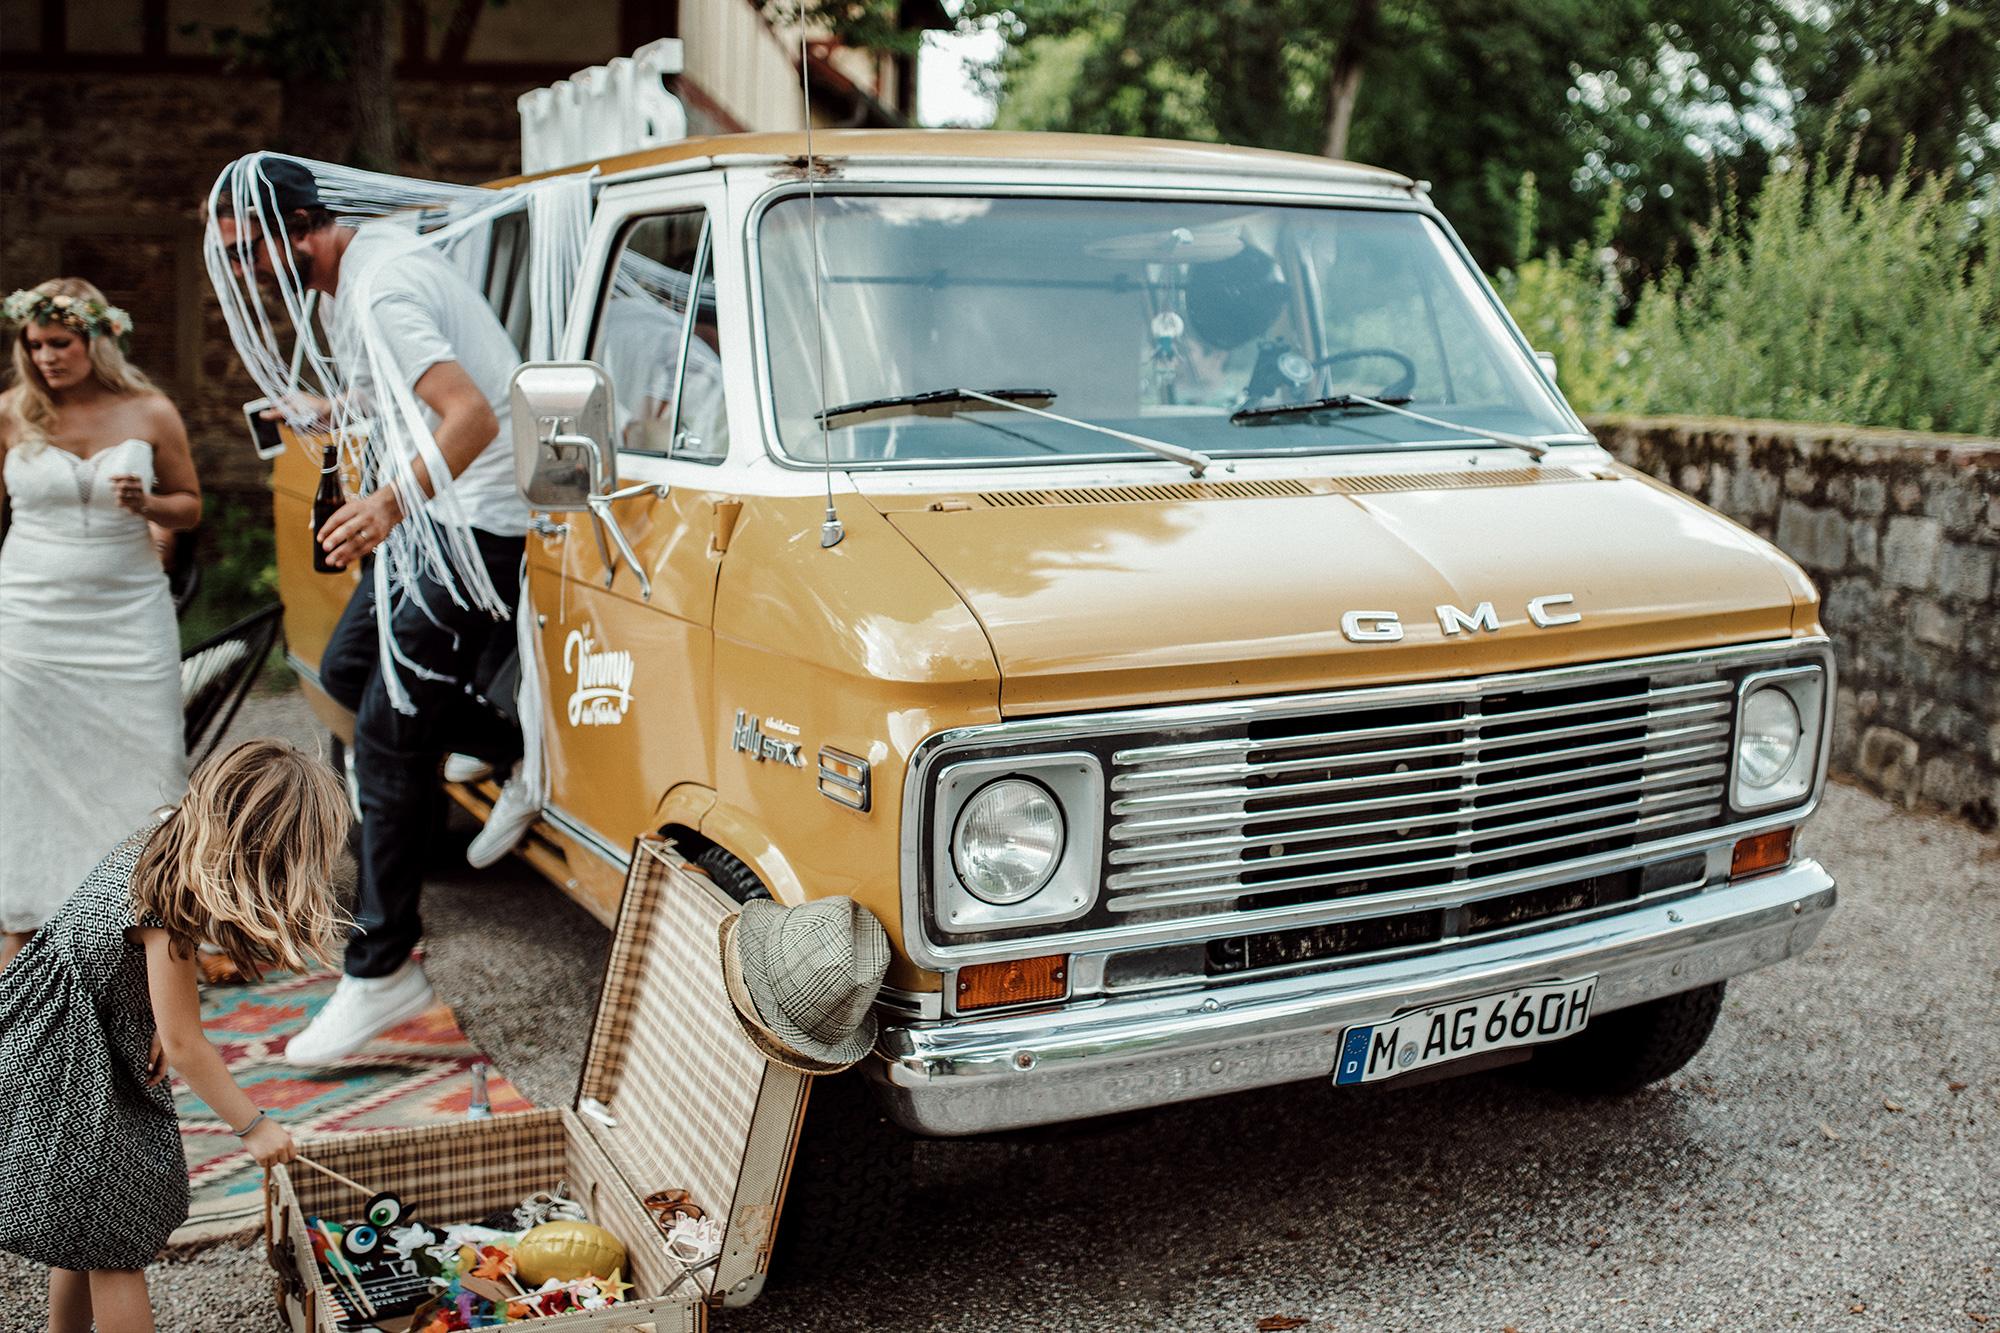 Fotobus Jimmy aus München vintage Surfer Bus mit Fotobox